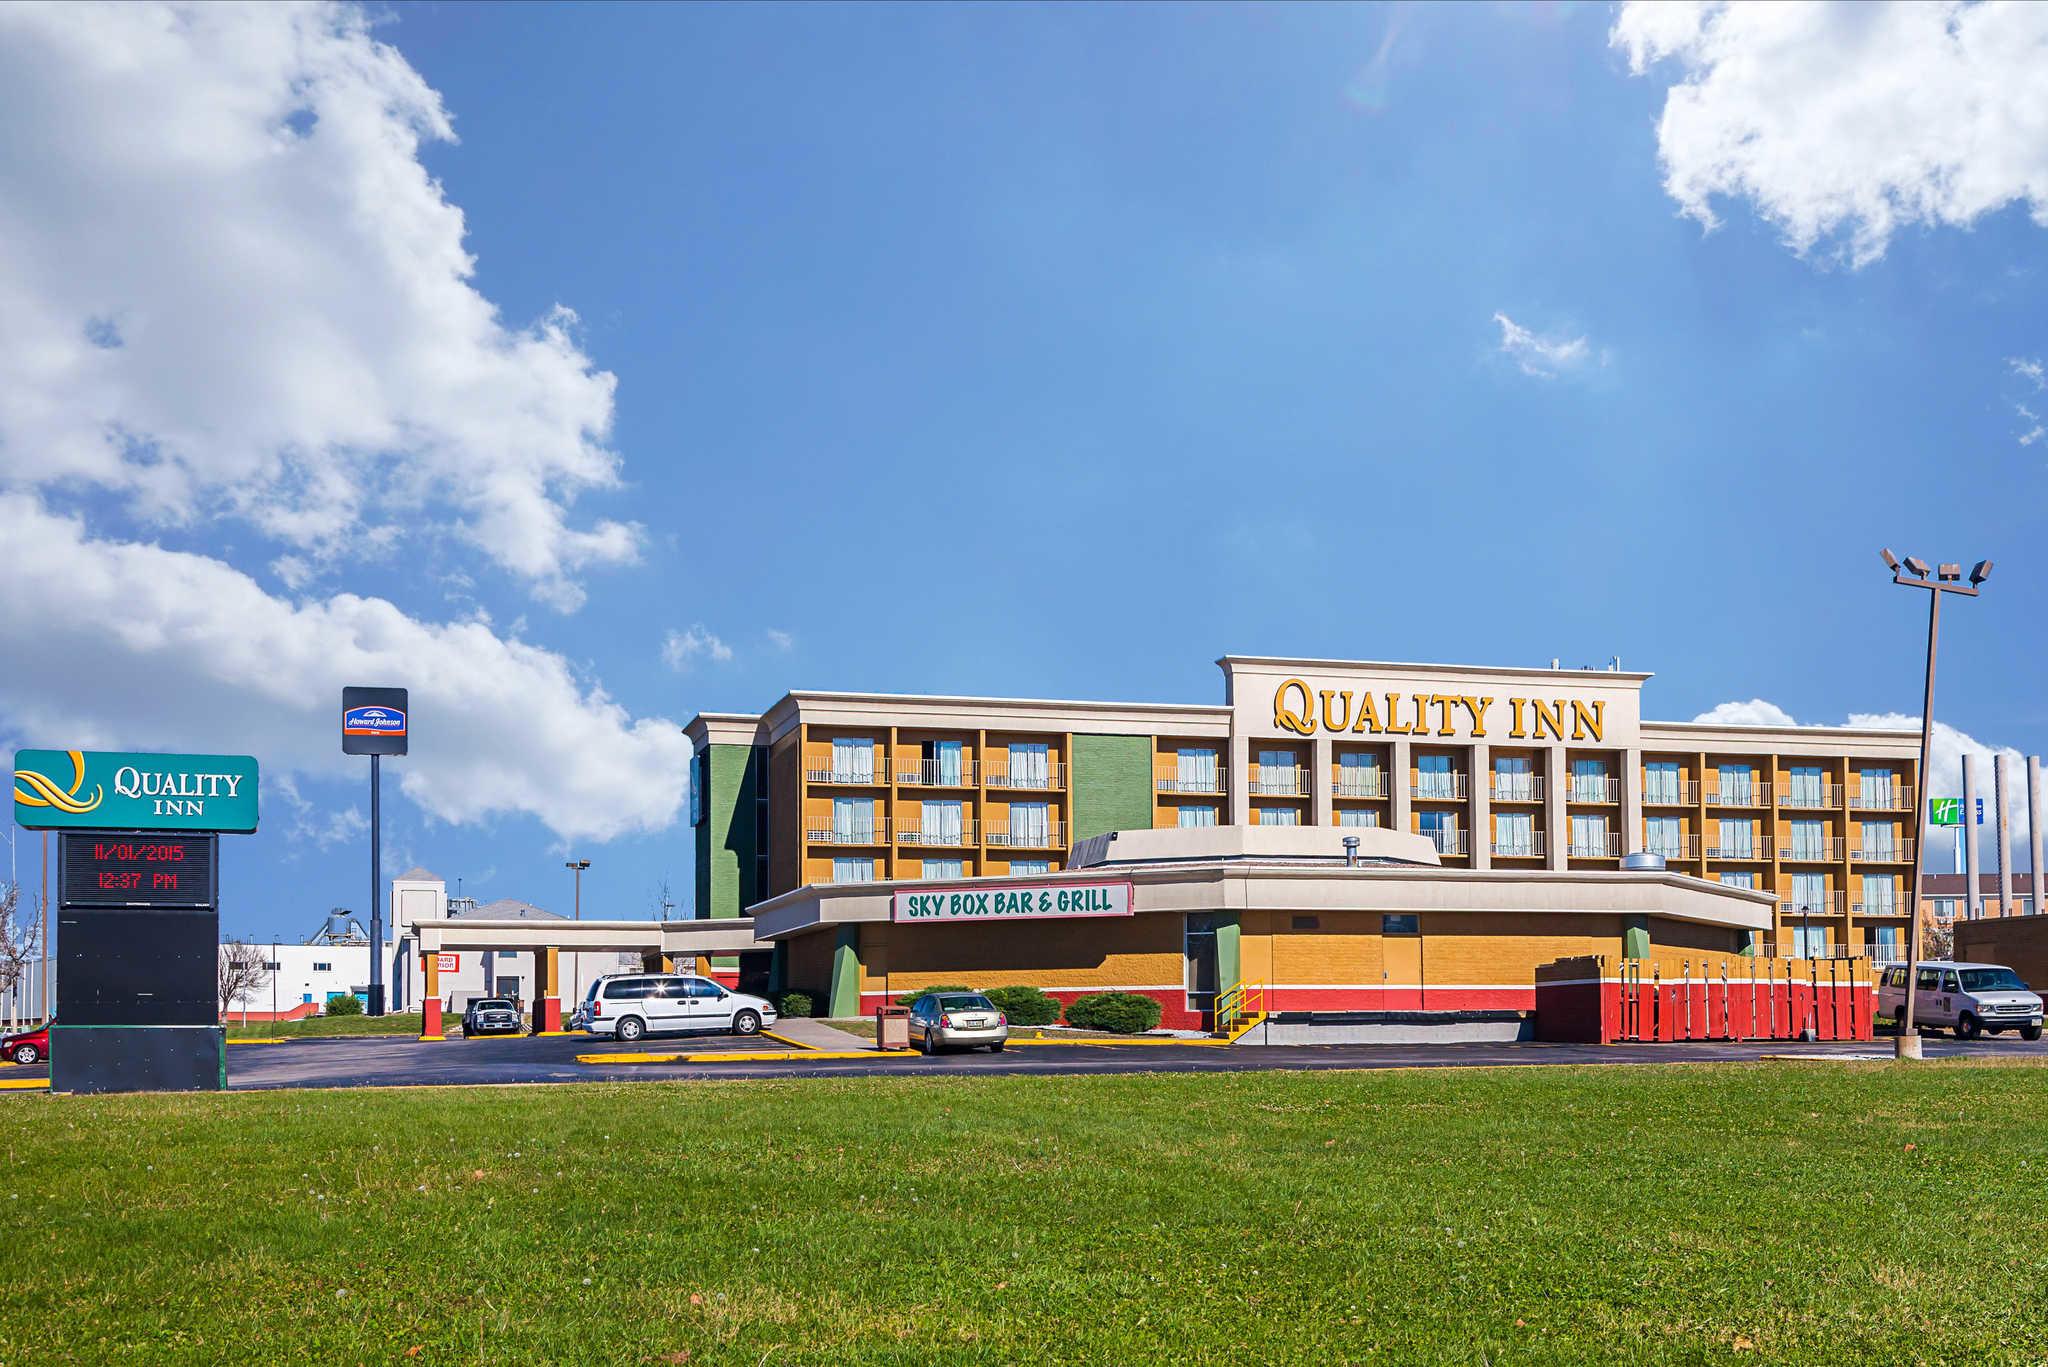 Quality Inn In Lincoln Ne 68521 Chamberofcommerce Com